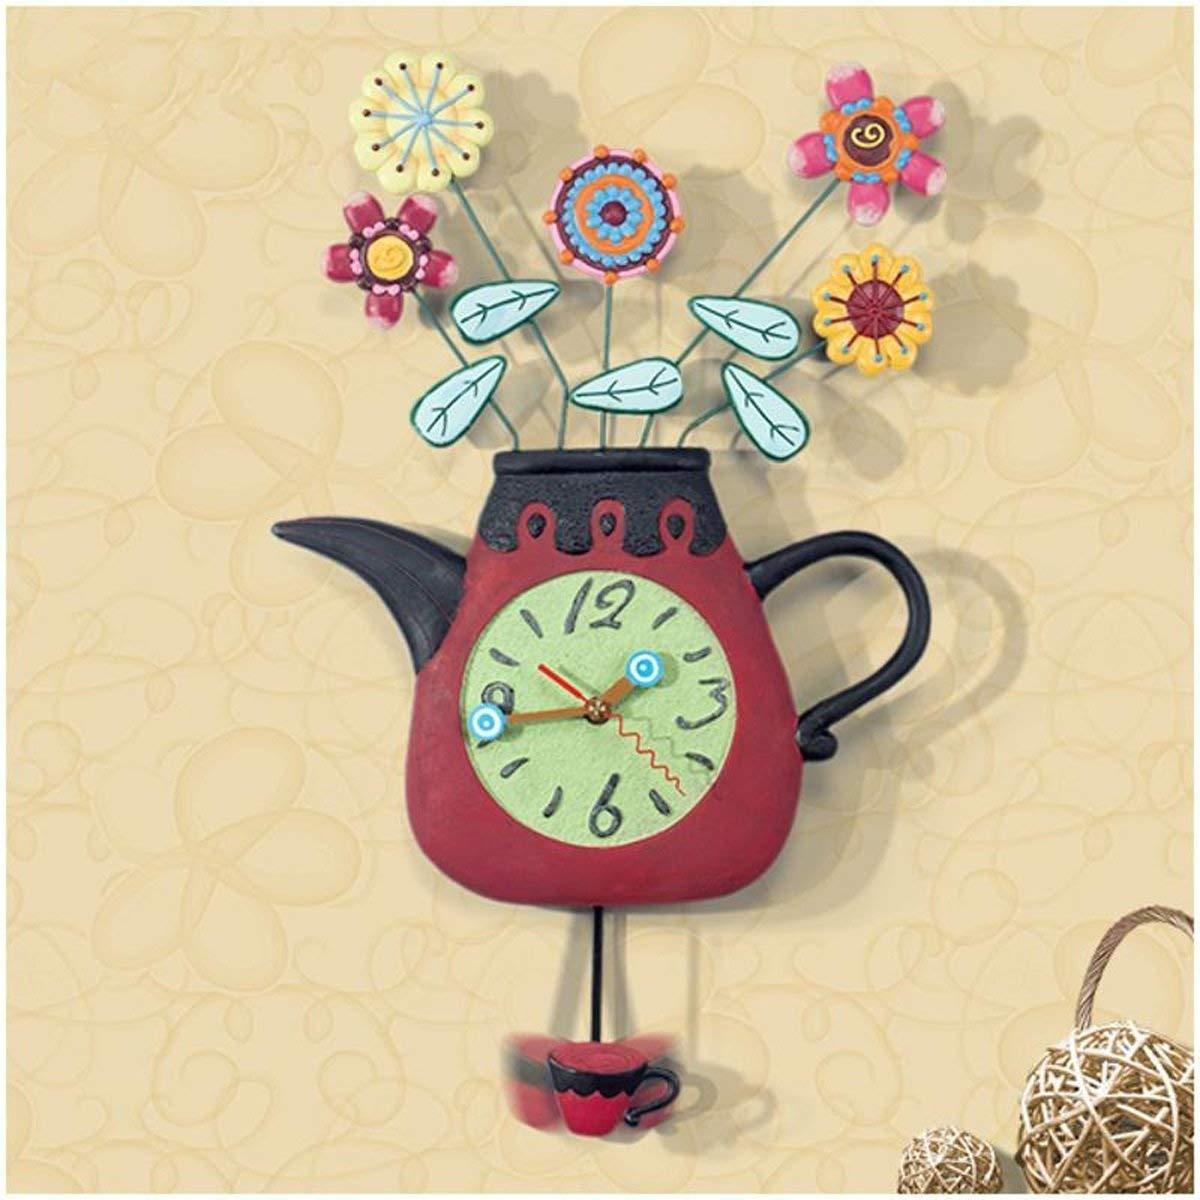 Mings Hermosa y Practica Reloj de Pared Creativo Sala de Estar Arte silencioso Resina de Resina Decorativa Reloj de Pared Columpio